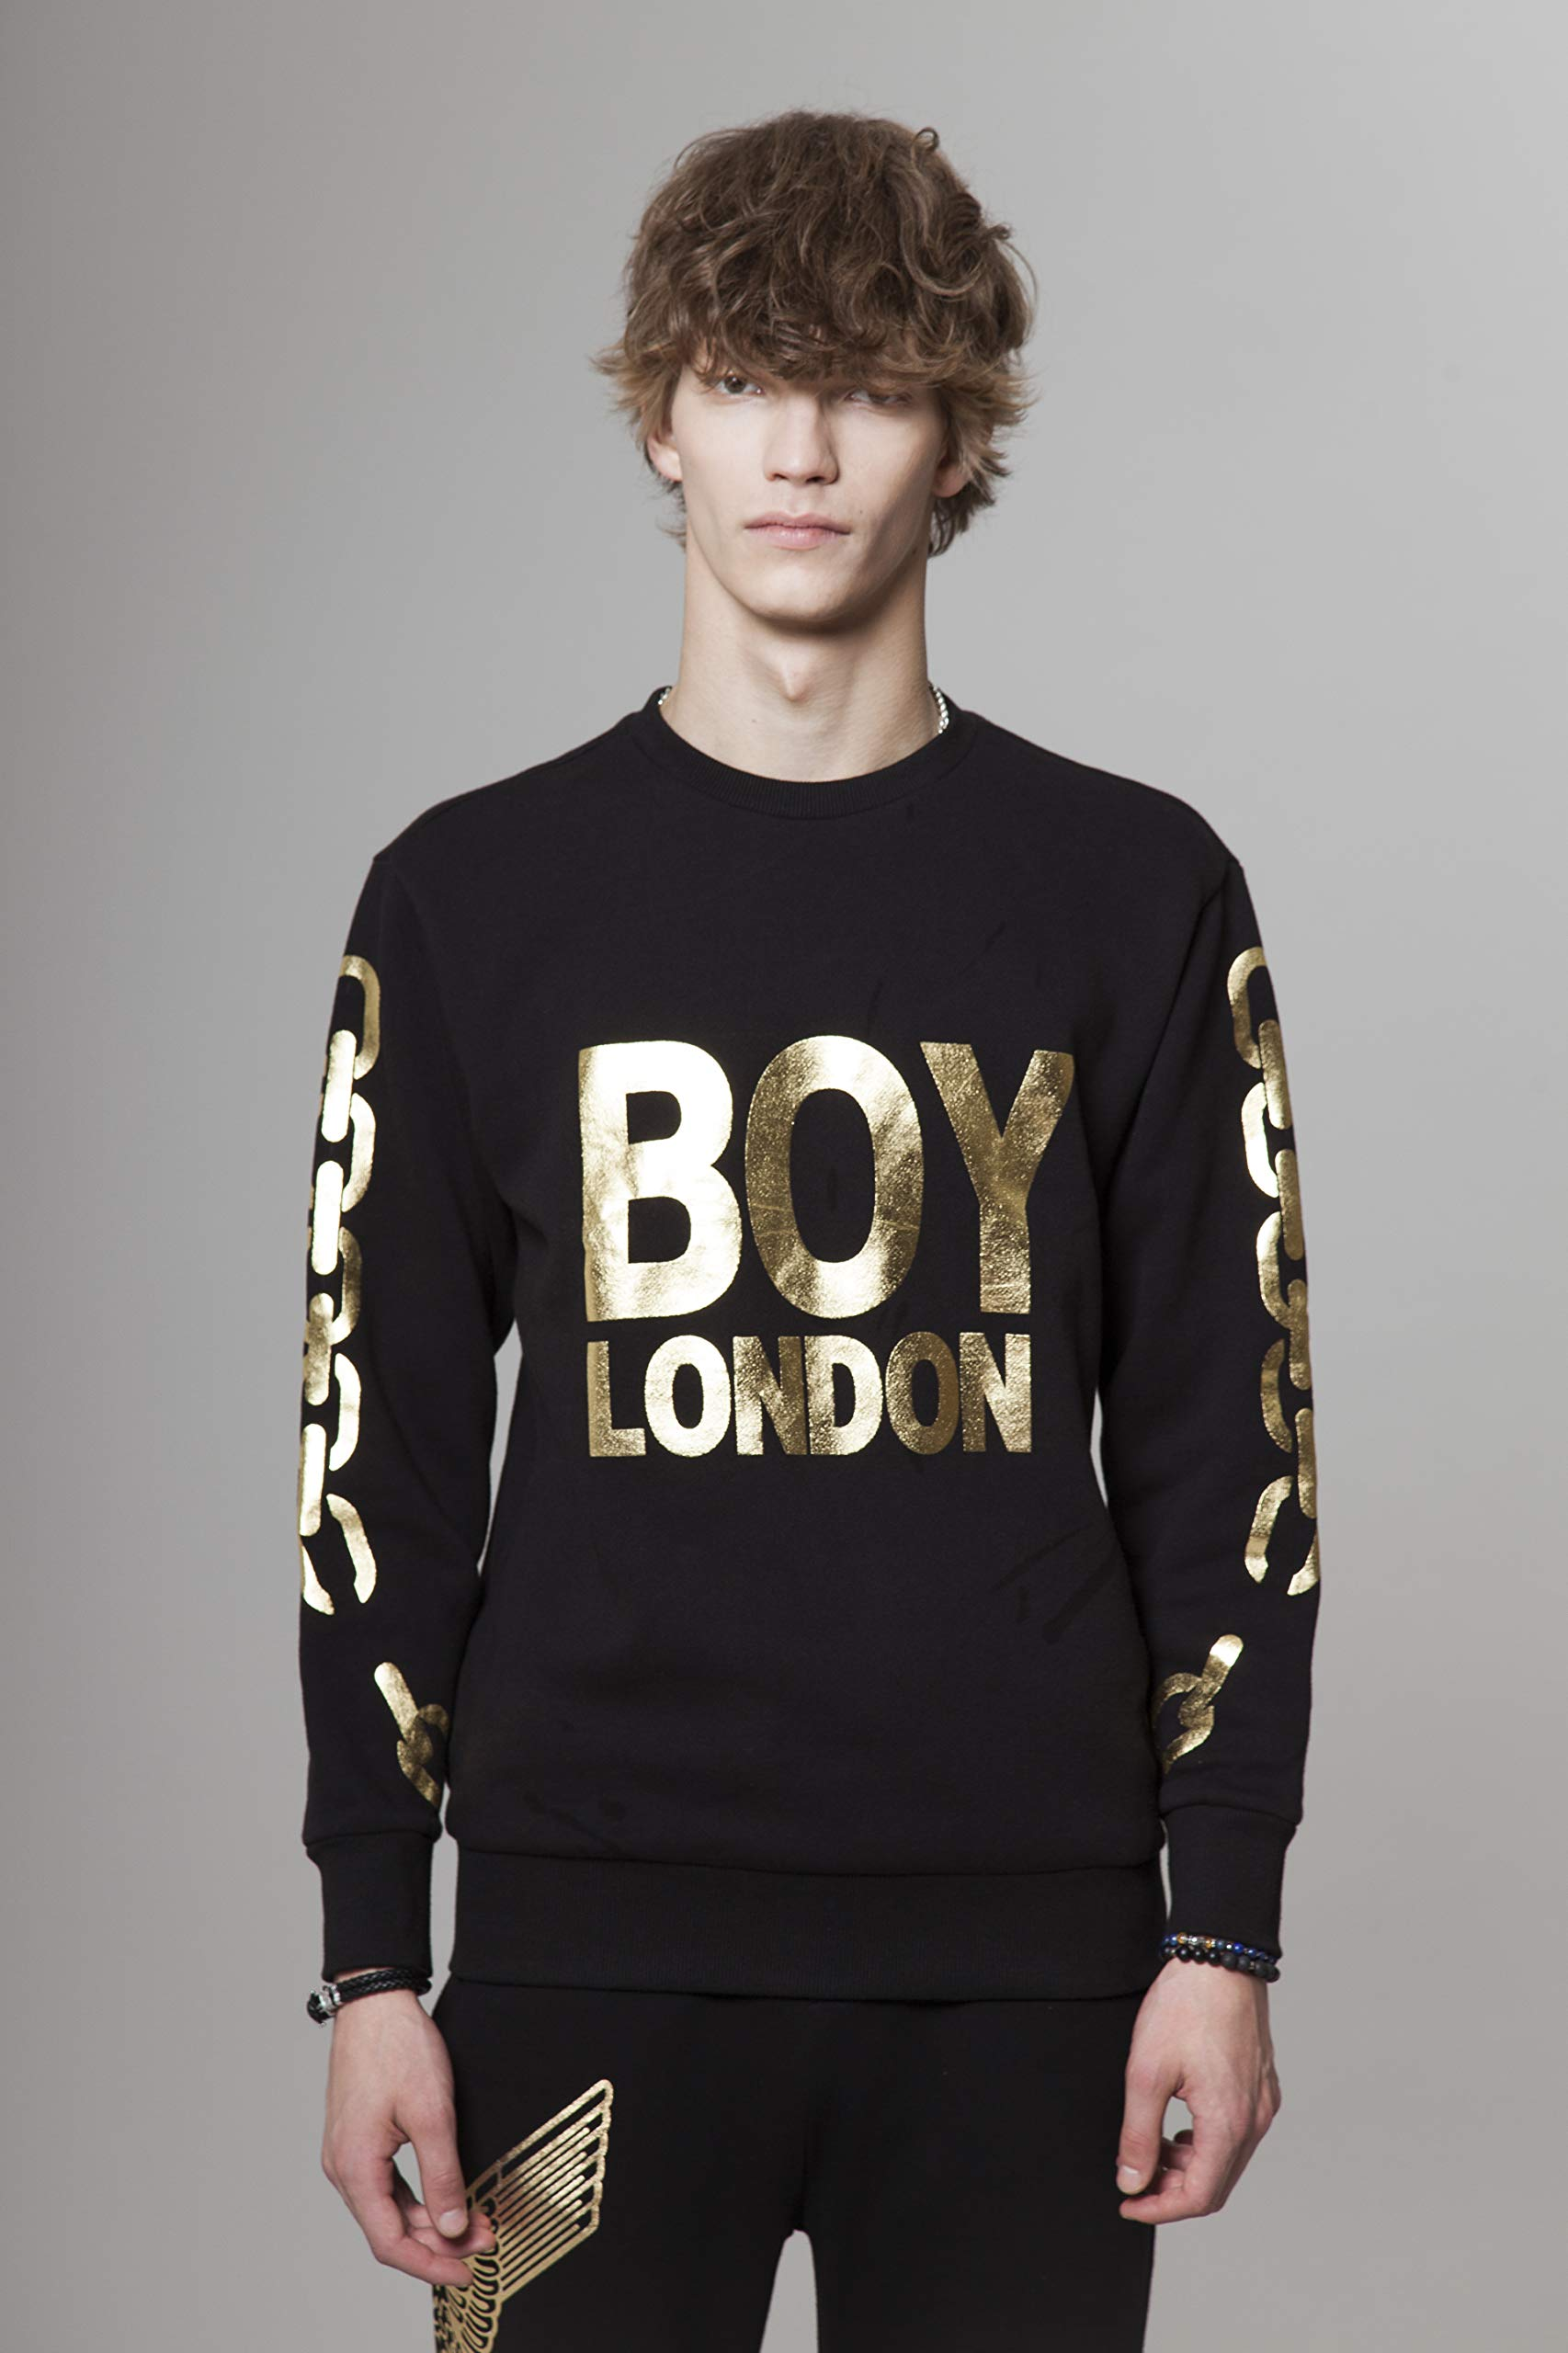 BOY LONDON Silver Chain Printed on Sleeves Sweatshirt-Black-Gold, Medium - BG4TL021 by BOY LONDON (Image #3)